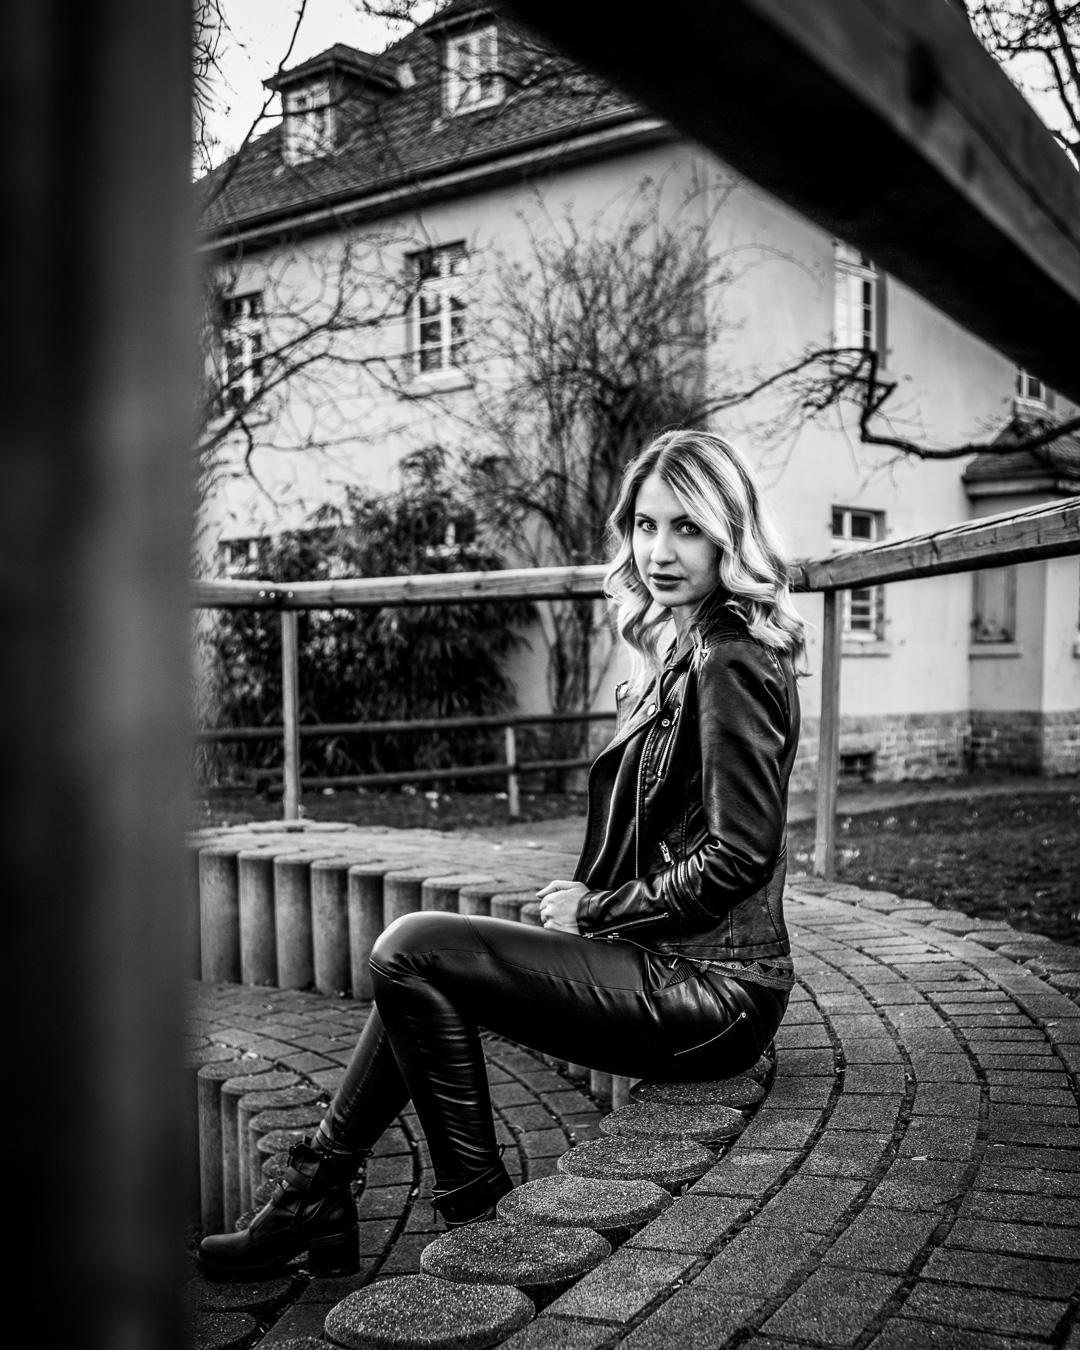 Frau in Lederjacke und Lederhose sitzt